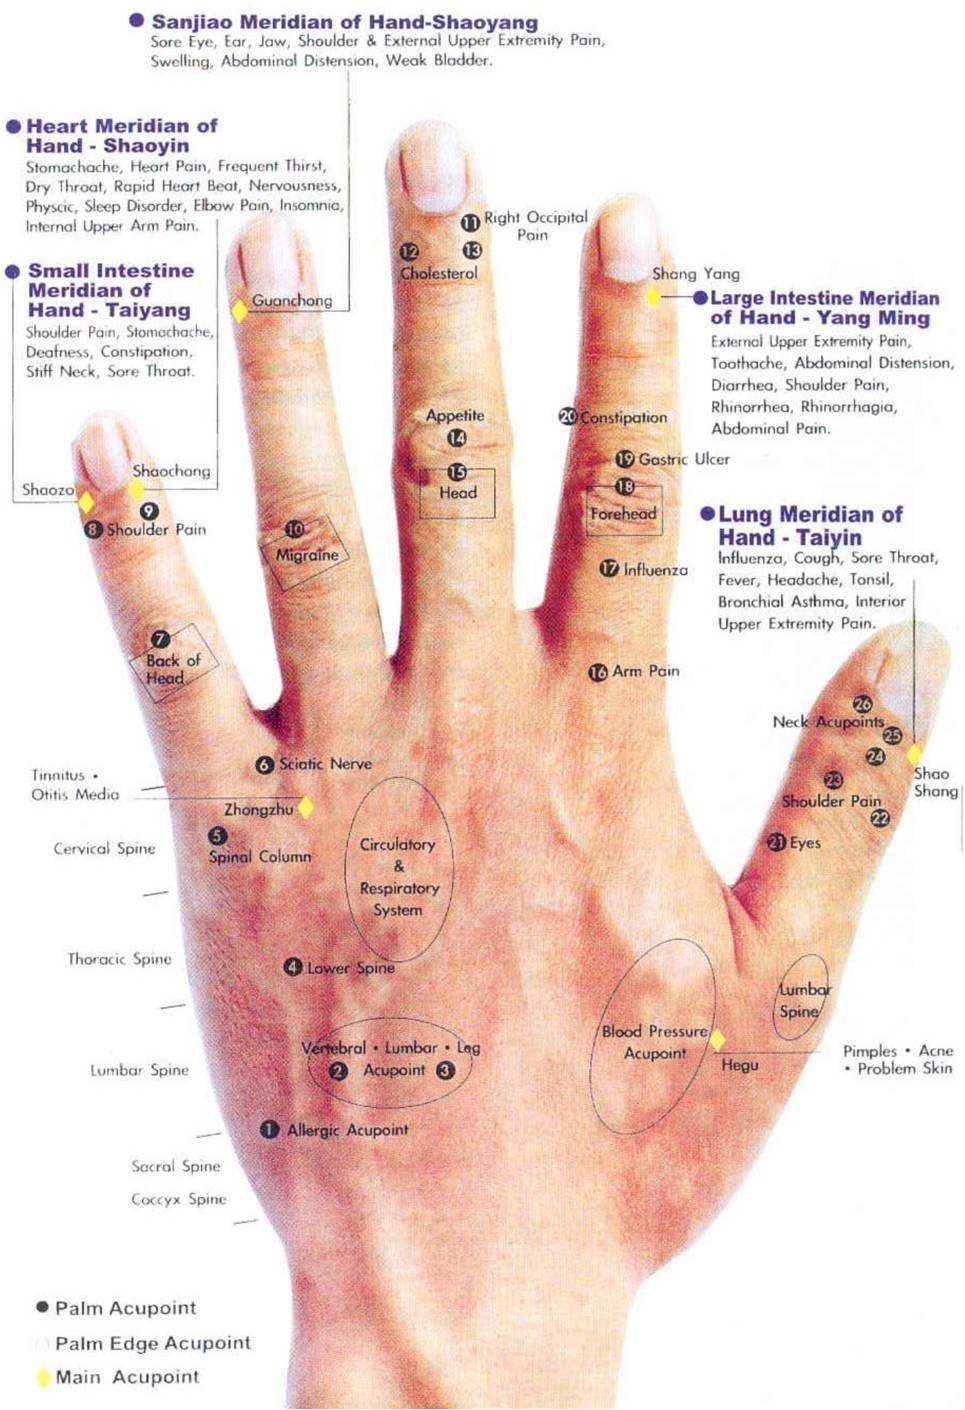 hight resolution of hand accupressure acupressure chart acupressure therapy acupressure massage acupressure points hand